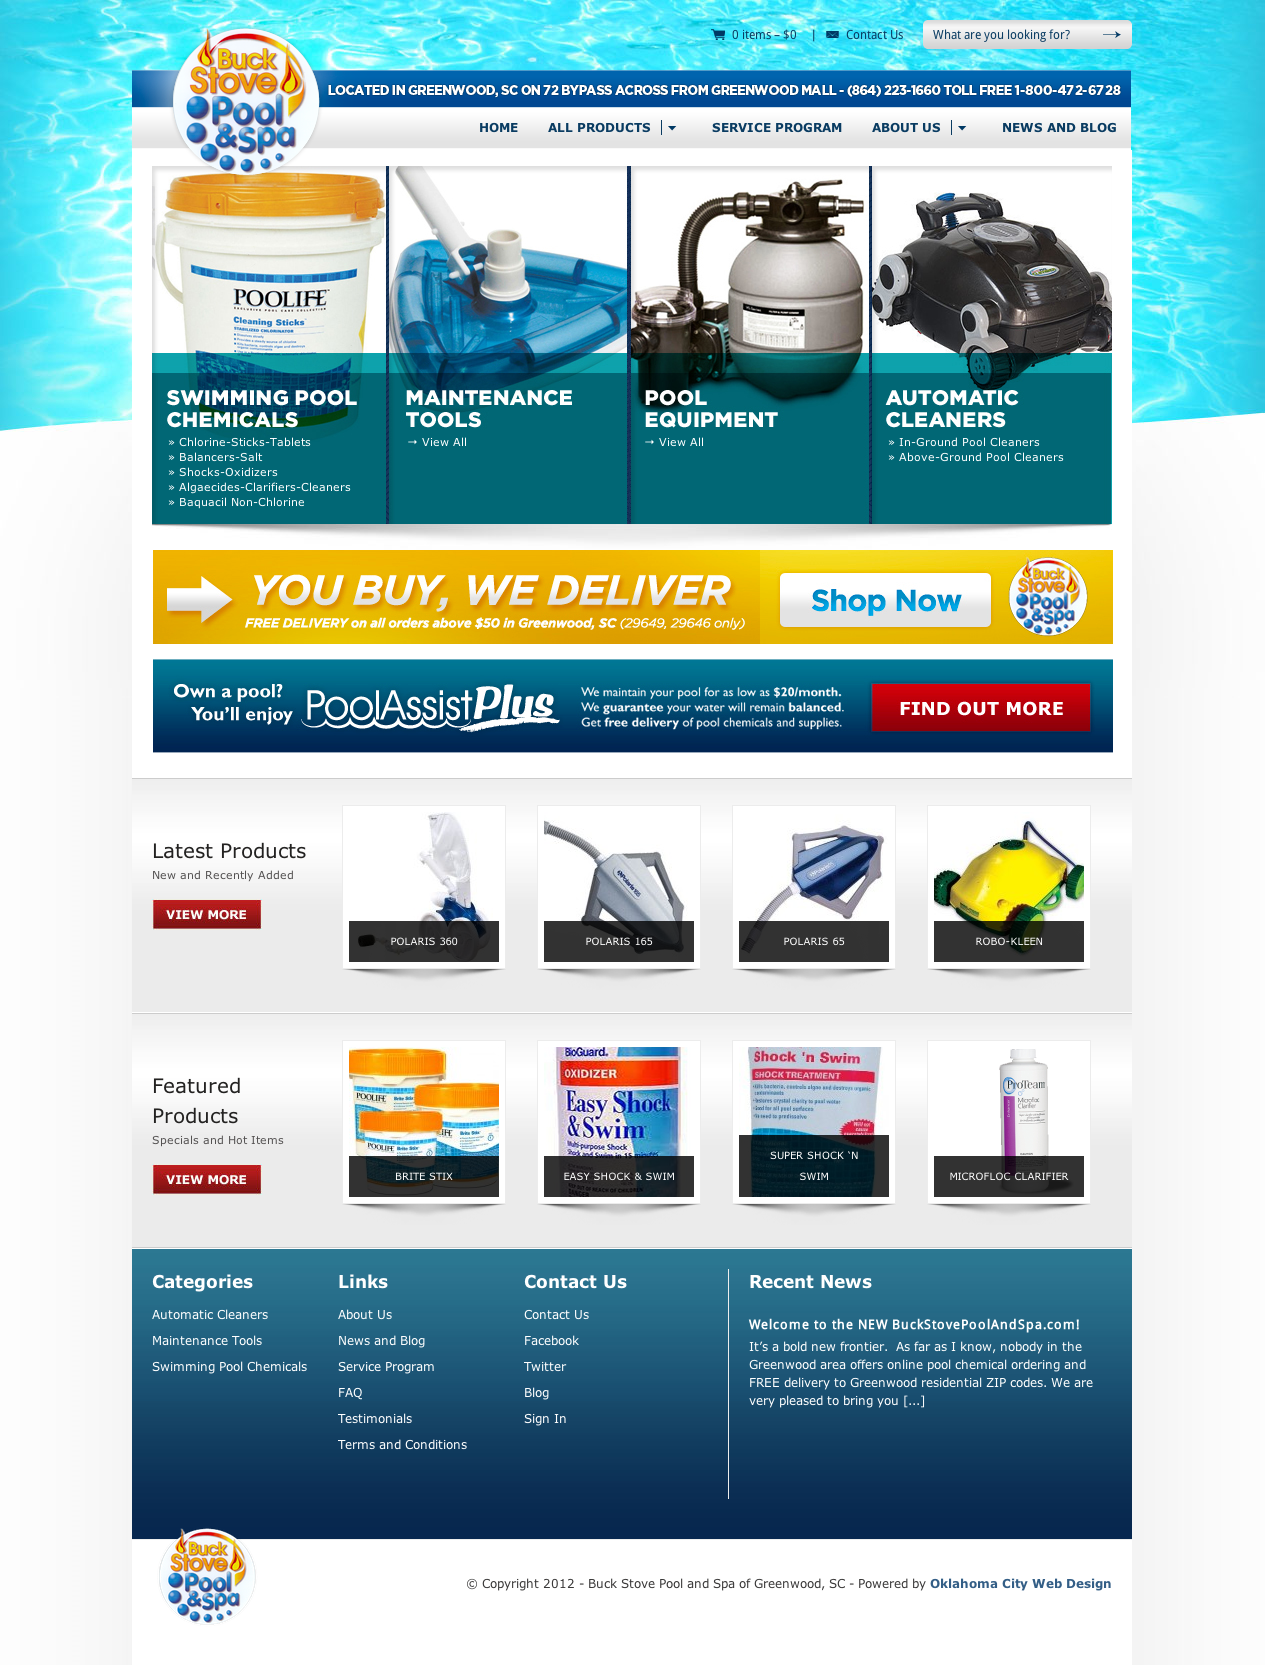 Buck Stove Pool and Spa Website - Ingage Creative